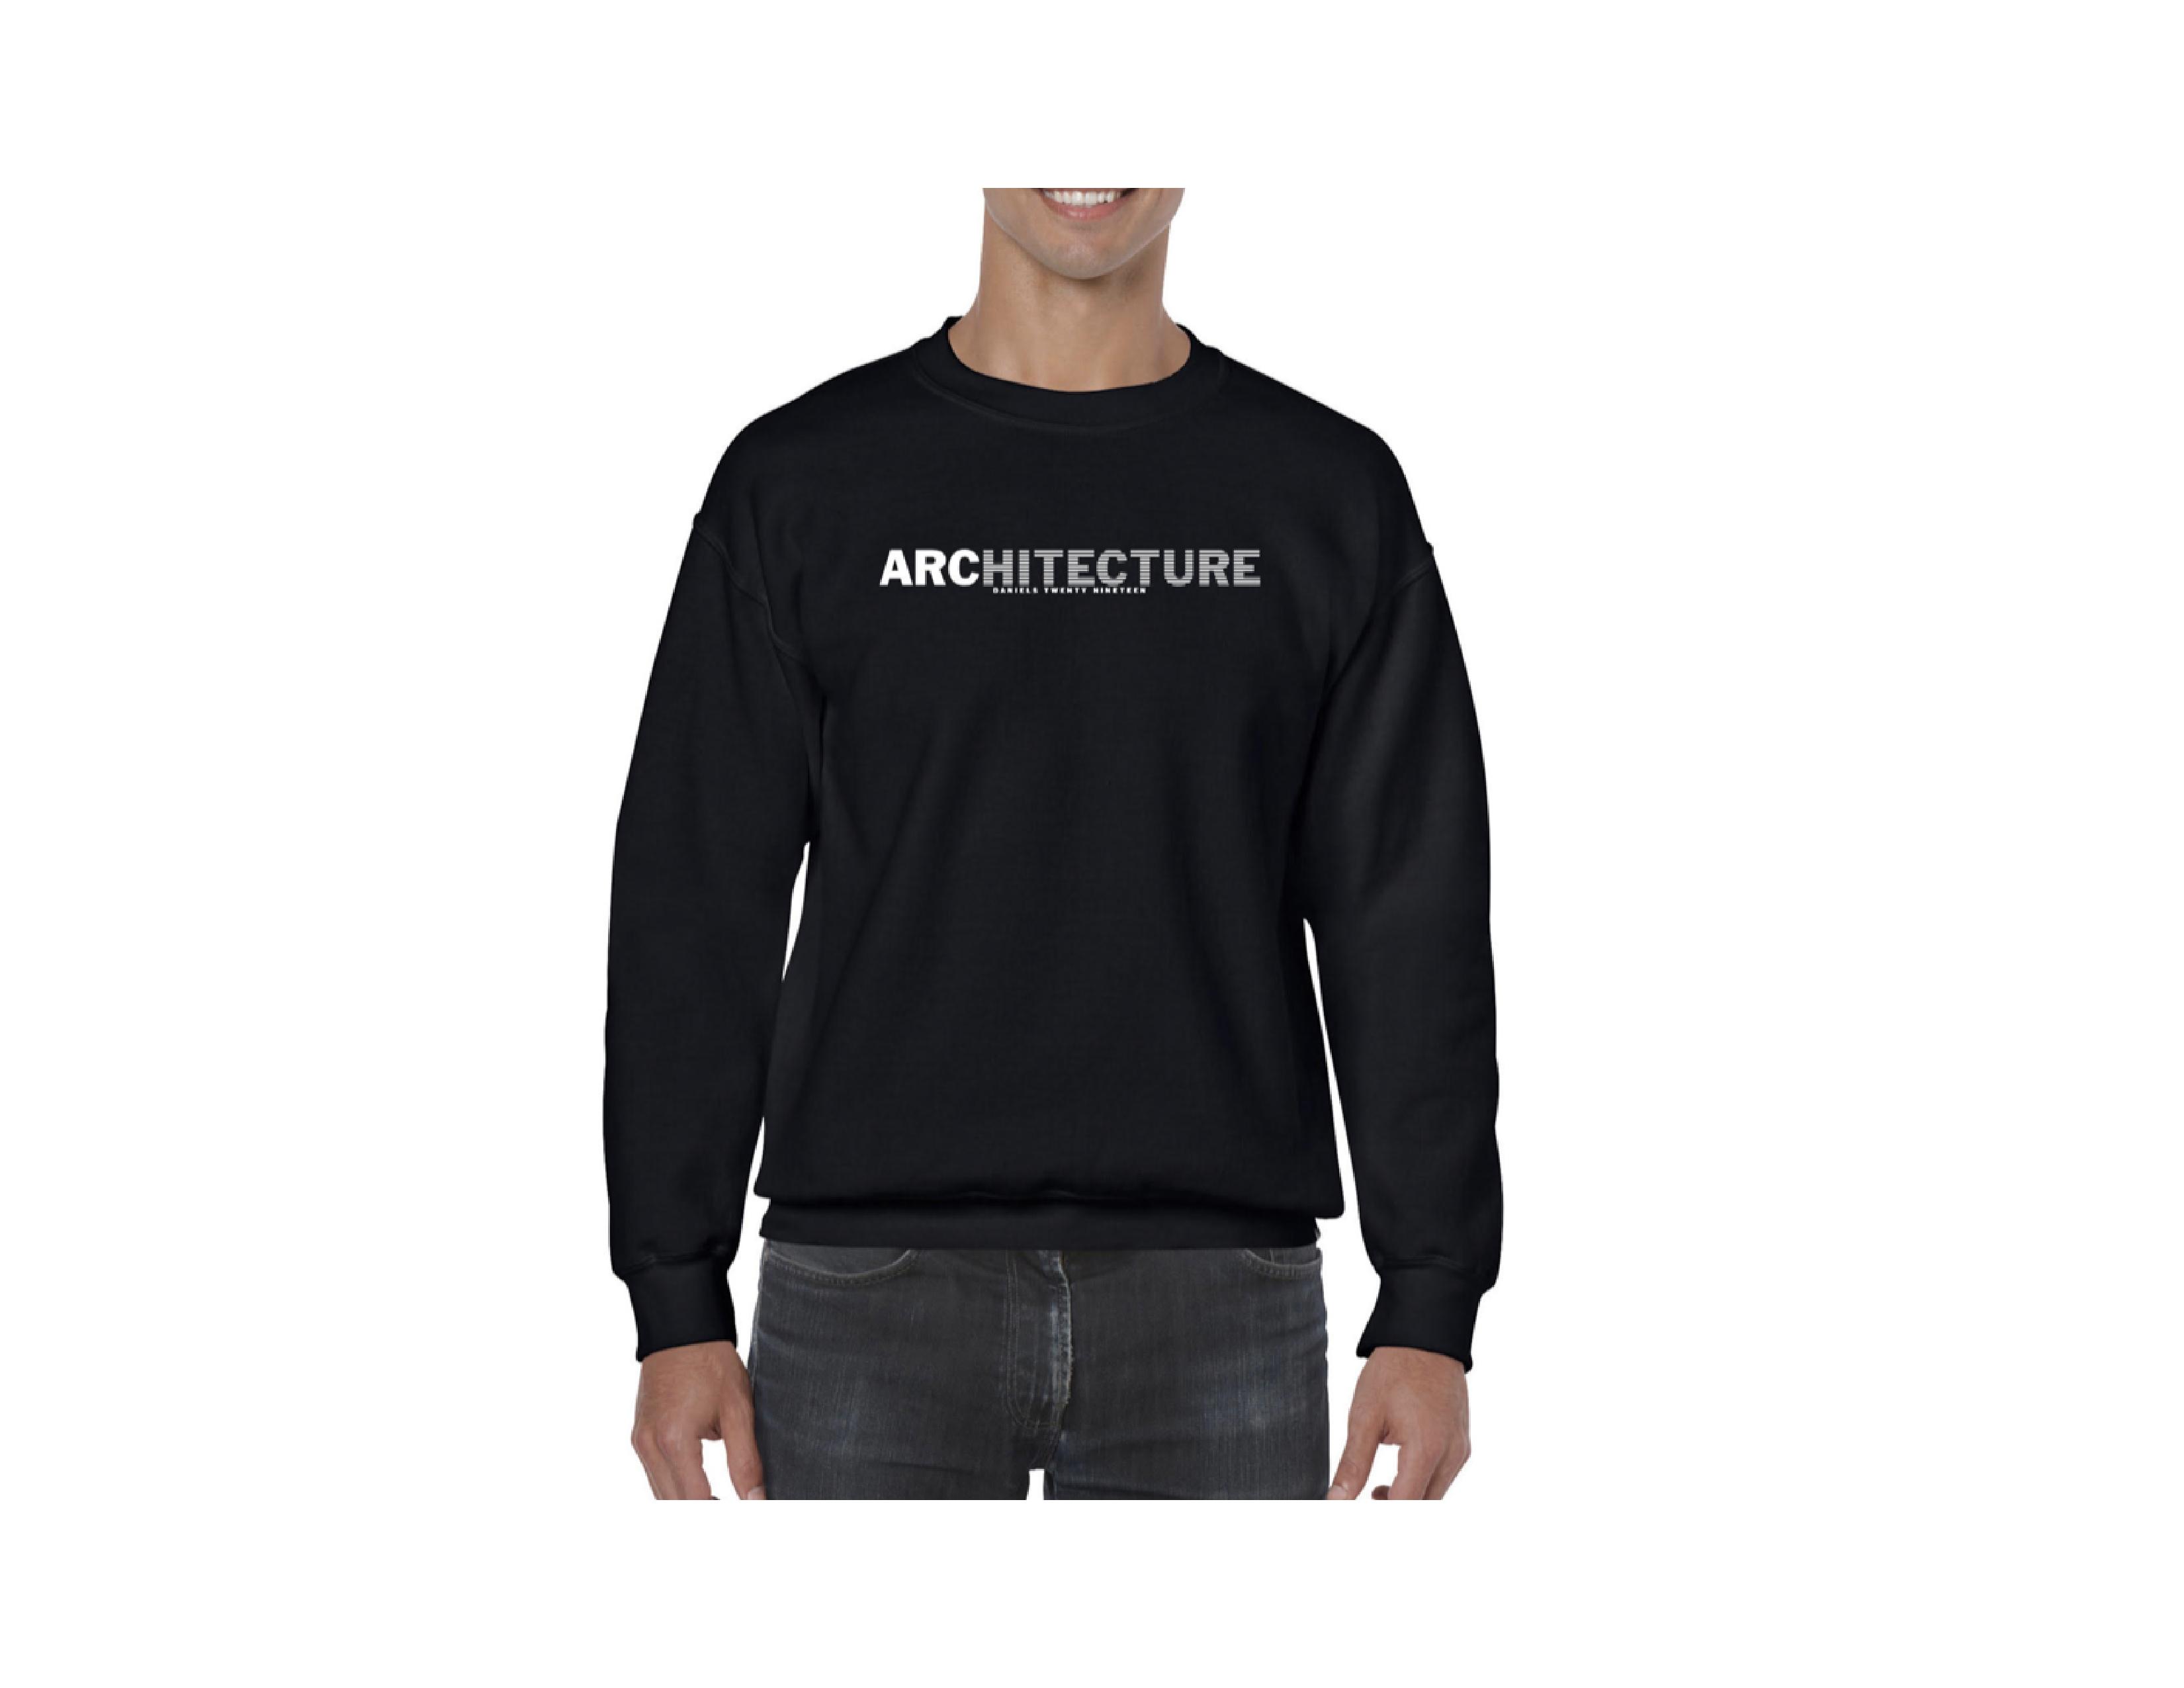 ARCHITECTURE TWENTY NINETEEN